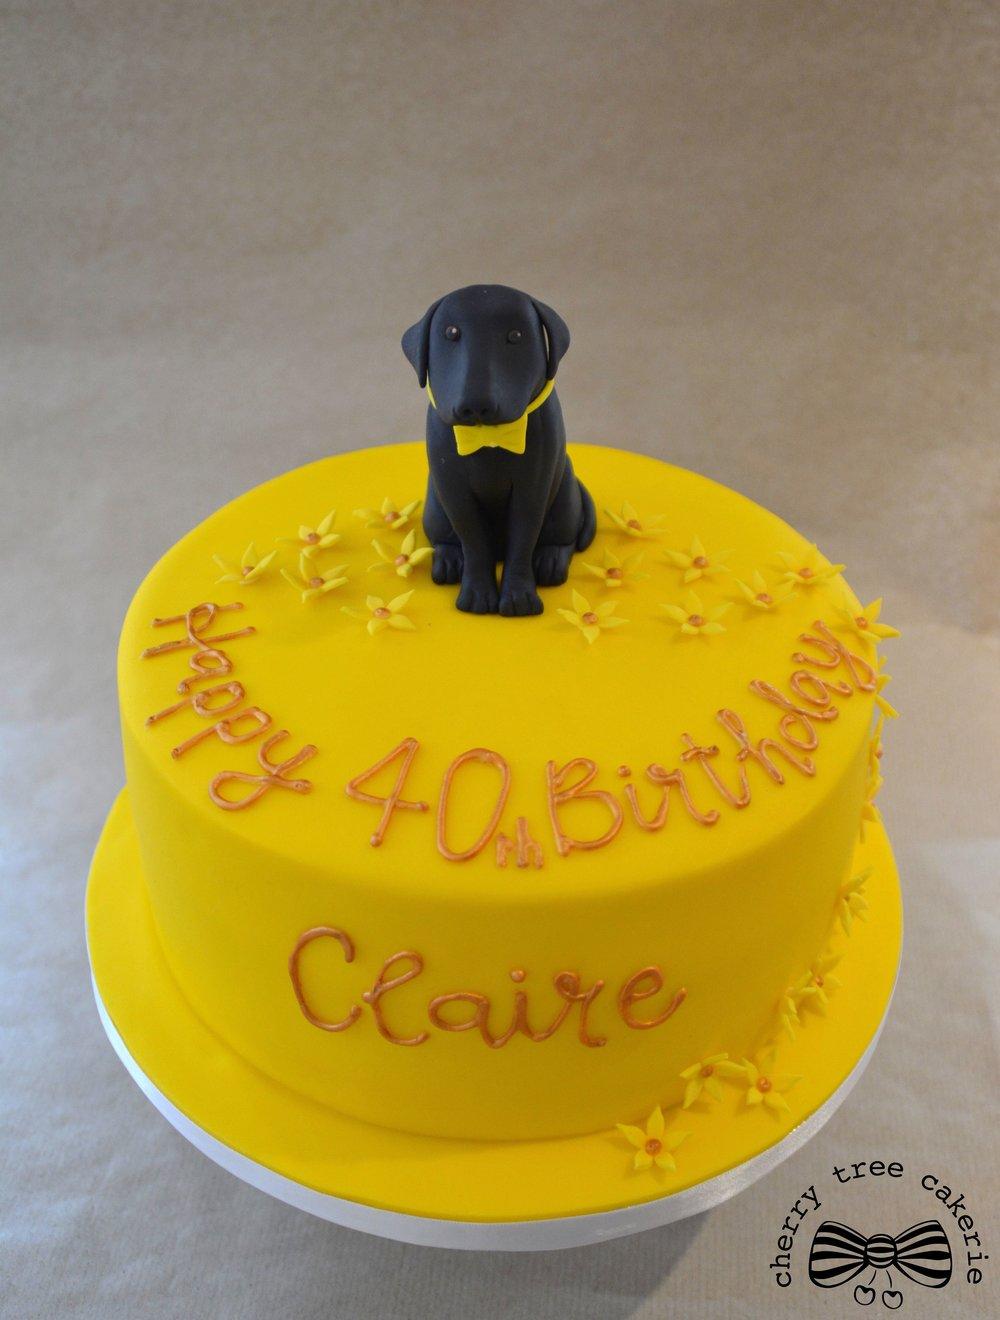 Black-labrador-yellow-birthday-cake